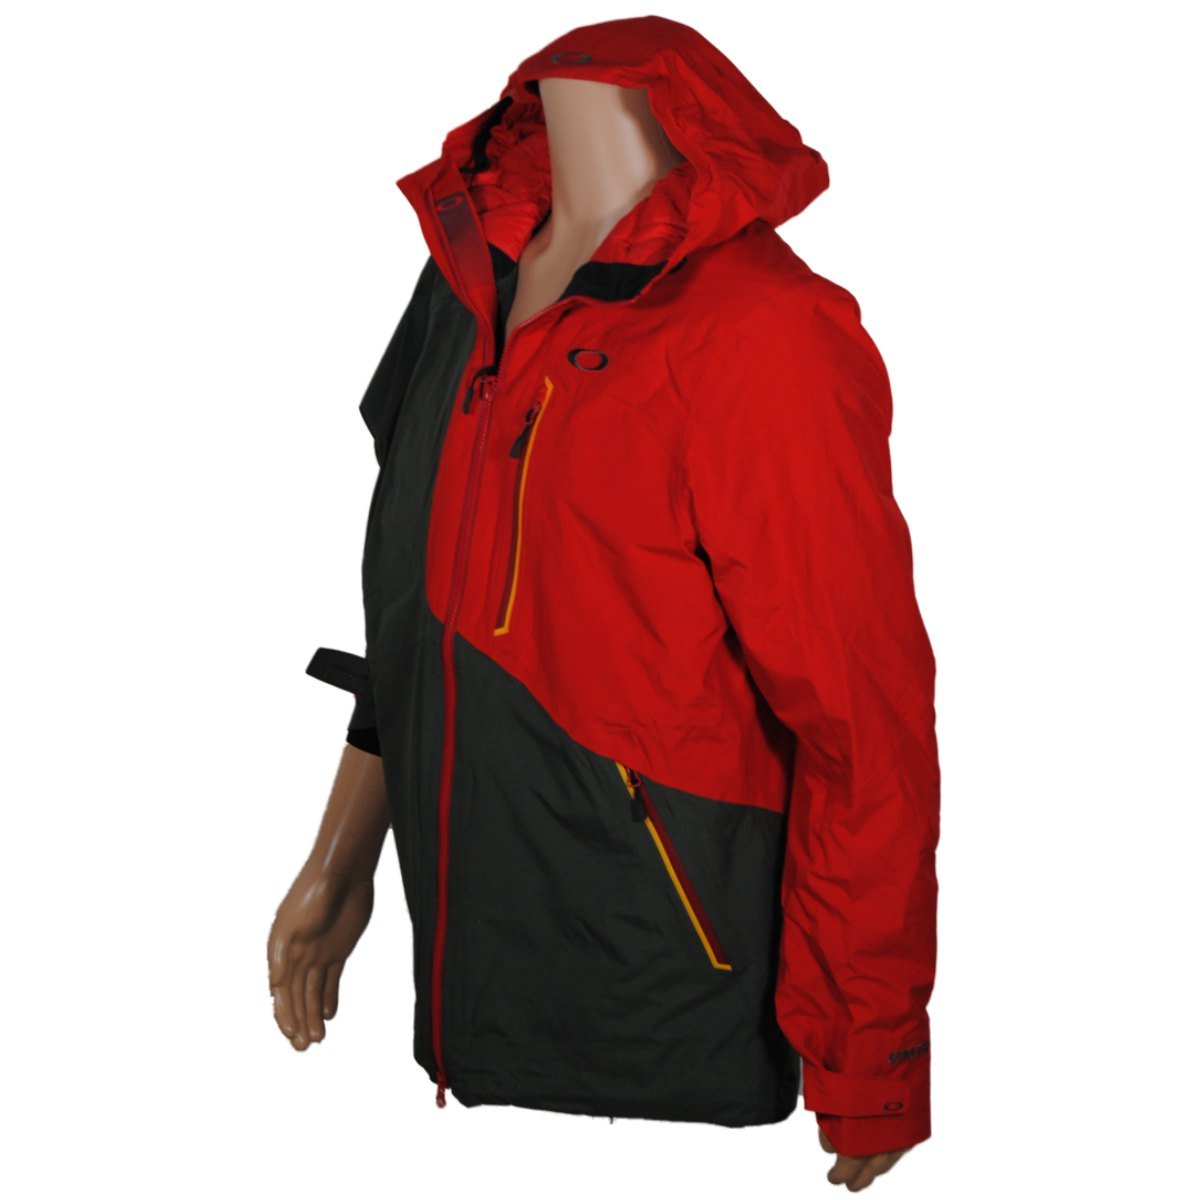 Herren Snowboard Jacke Oakley Crescent Jacket jetzt kaufen